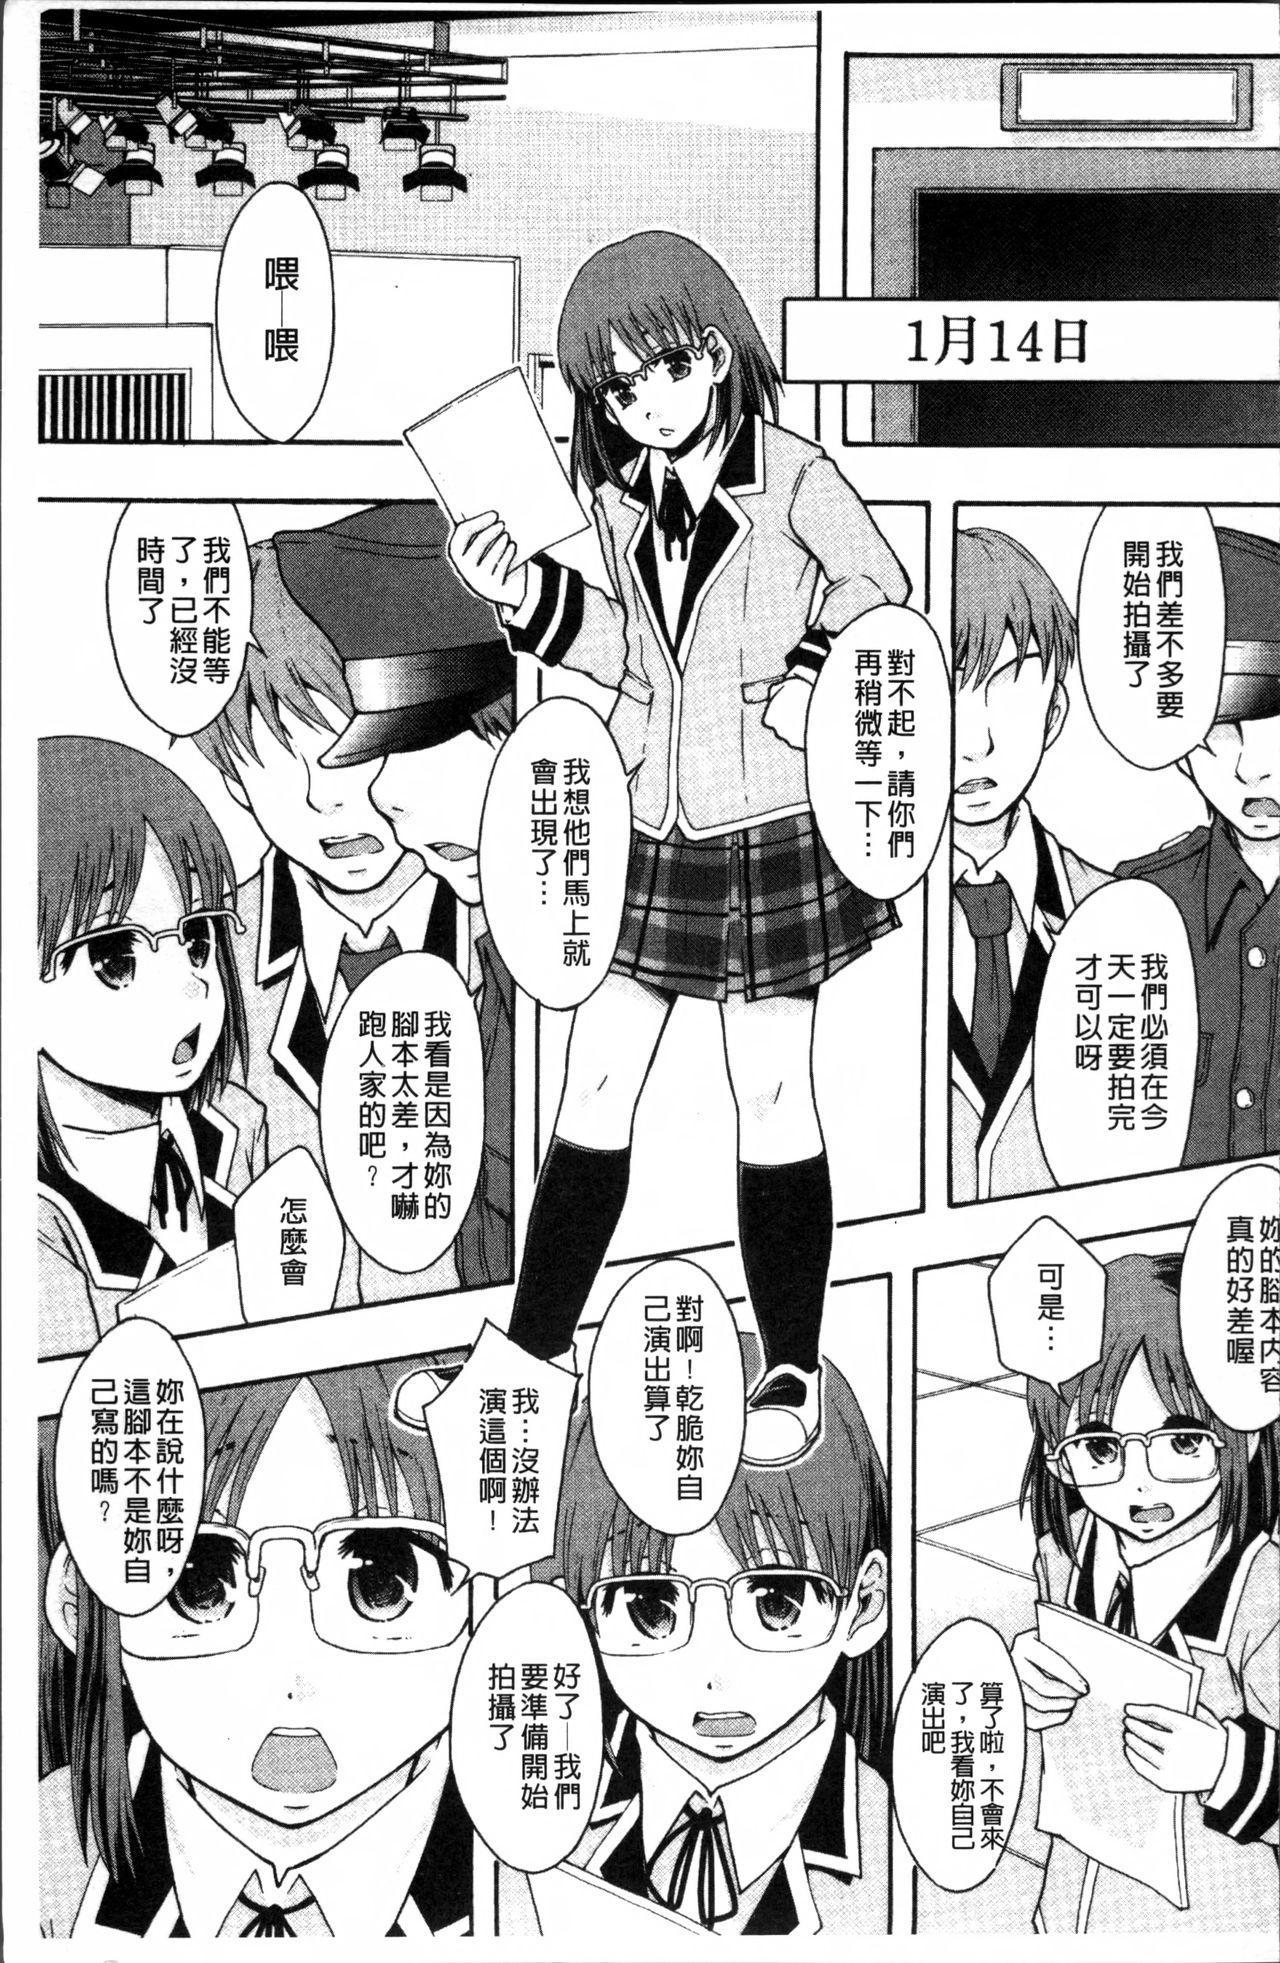 Anoko no Class wa AV-ka 155